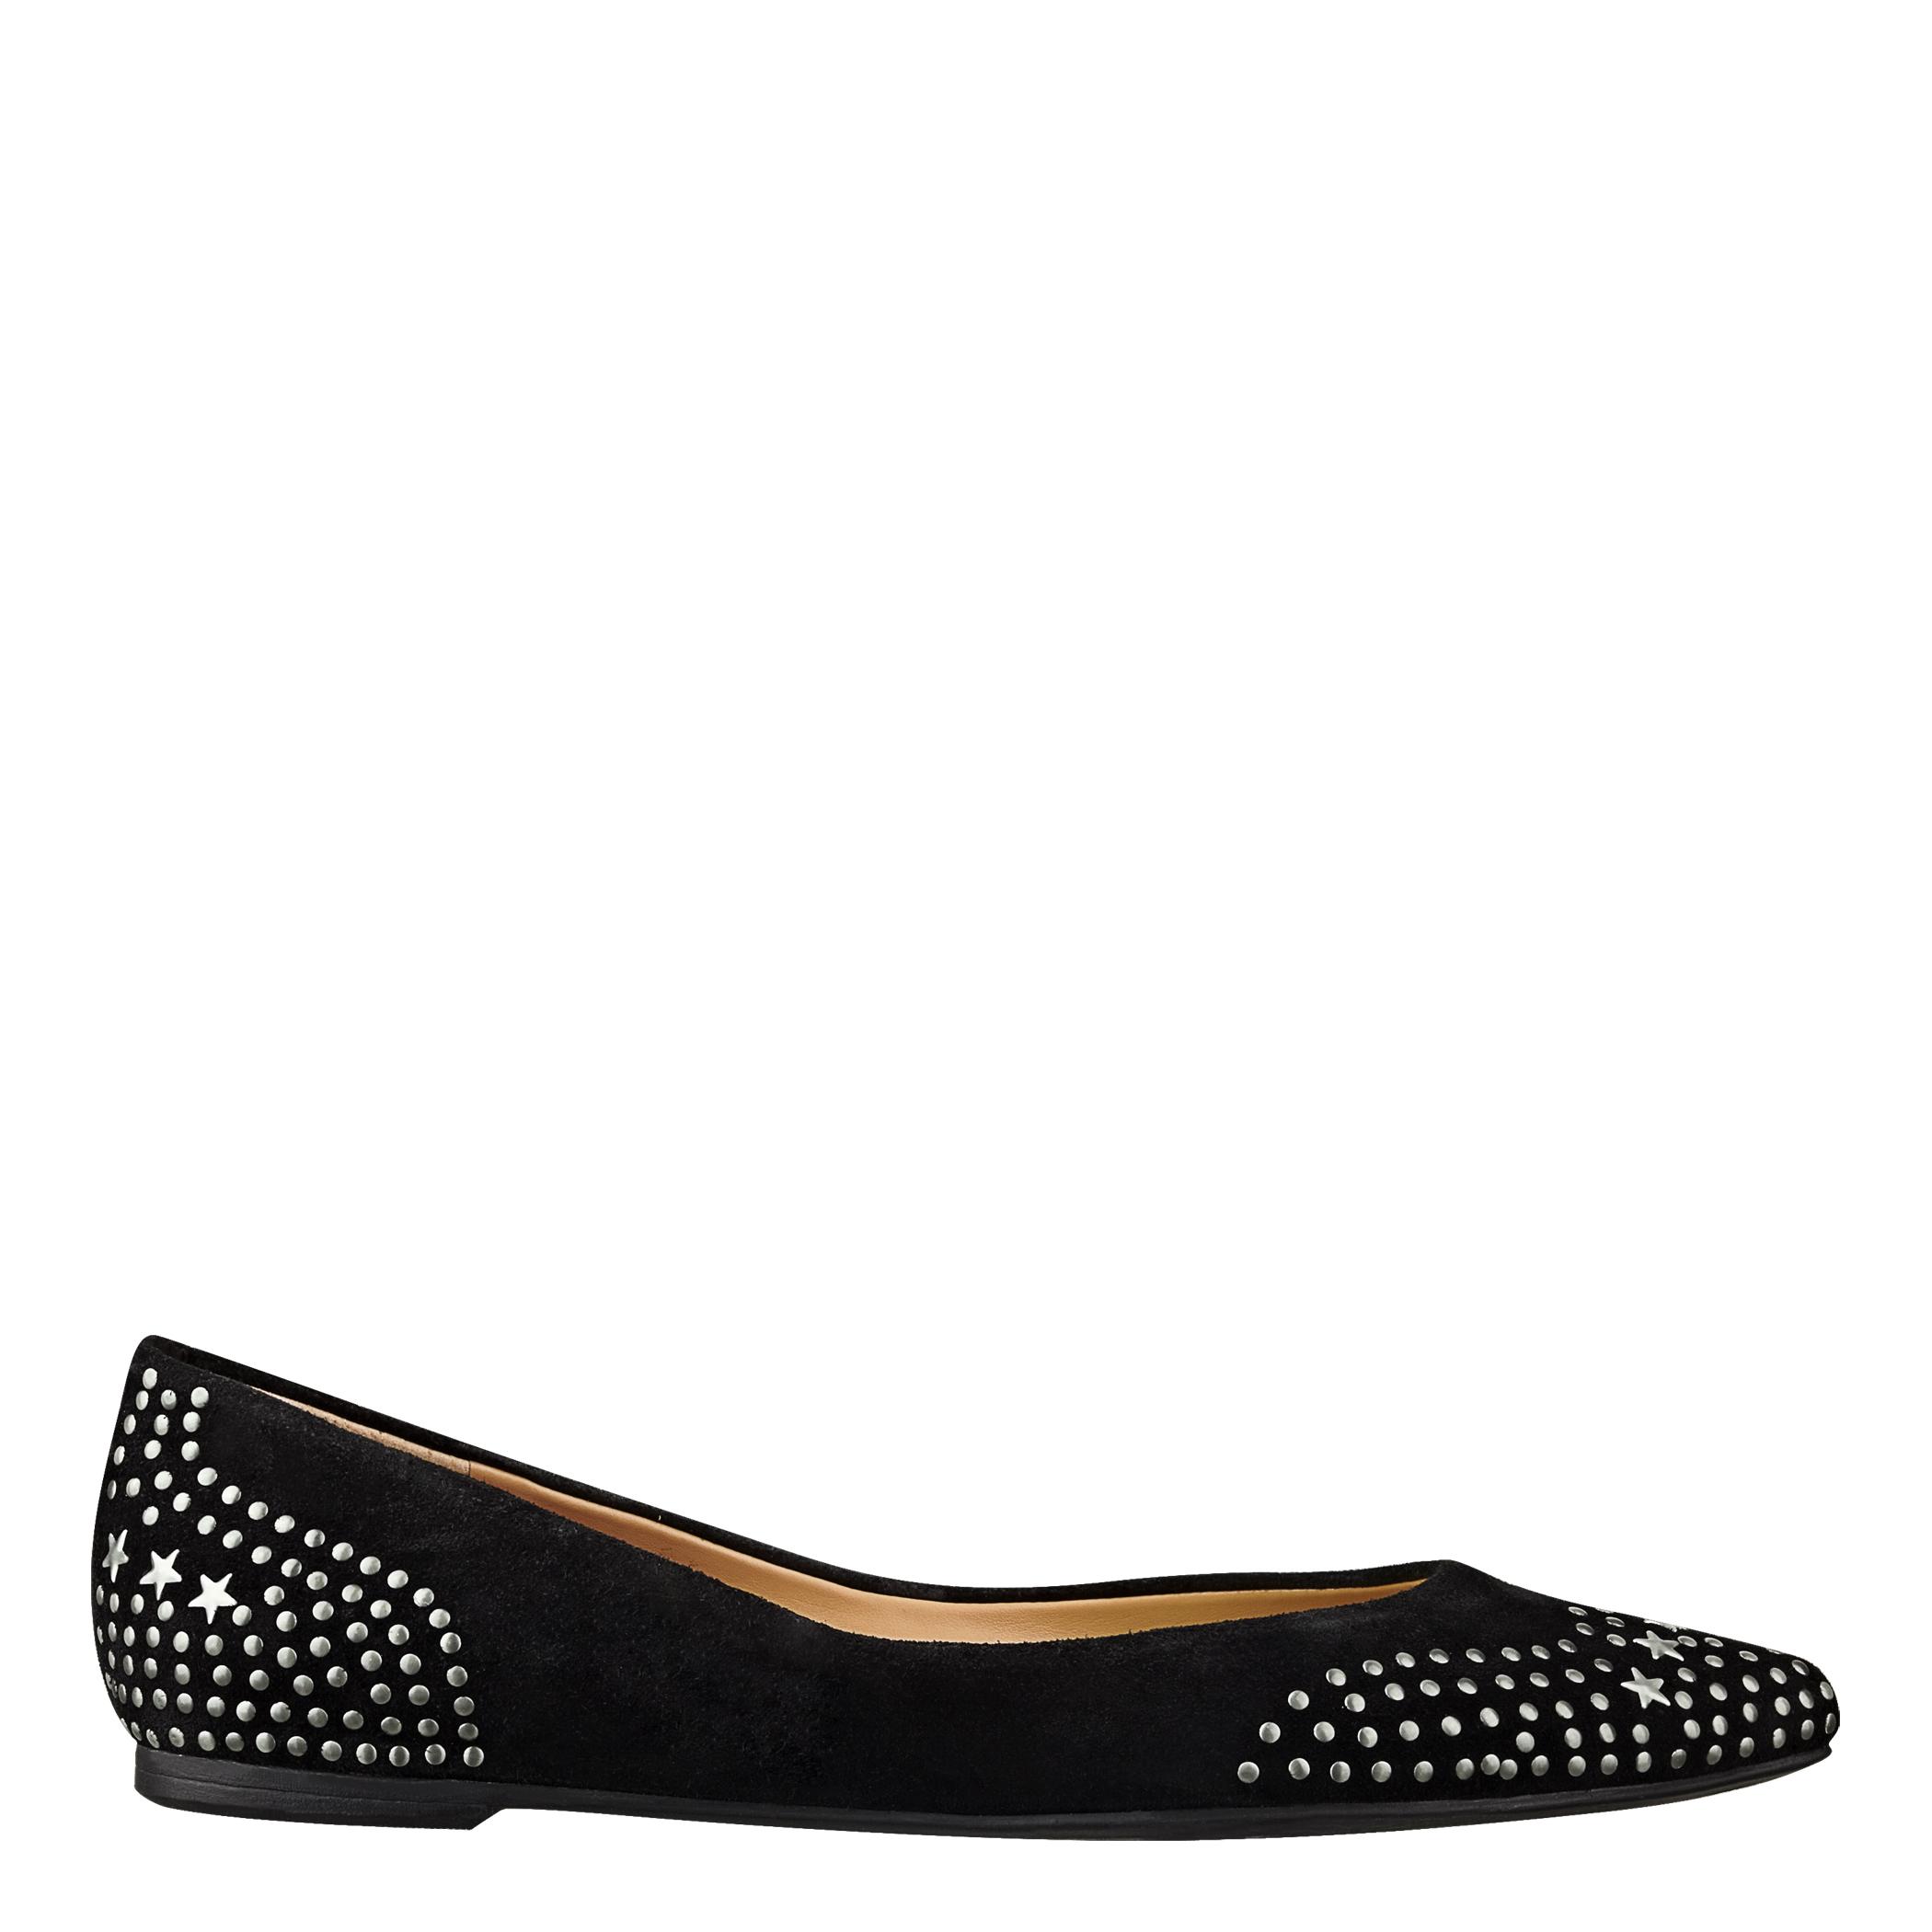 nine west essayday pointy toe flat in black black suede